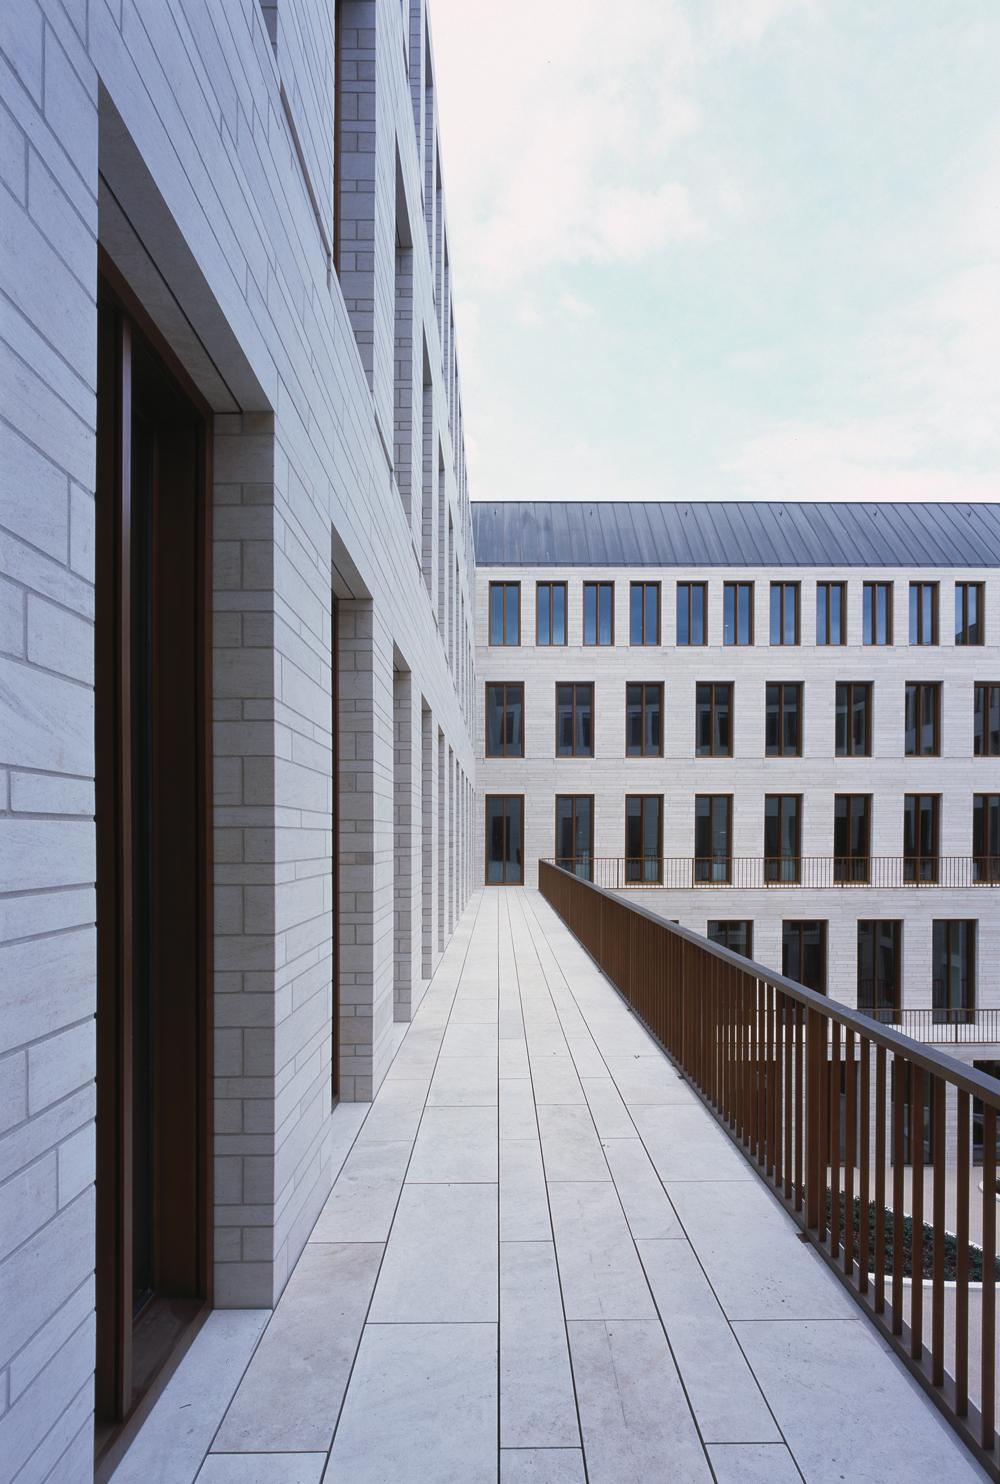 Neubau L-Bank Karlsruhe - DETAIL inspiration